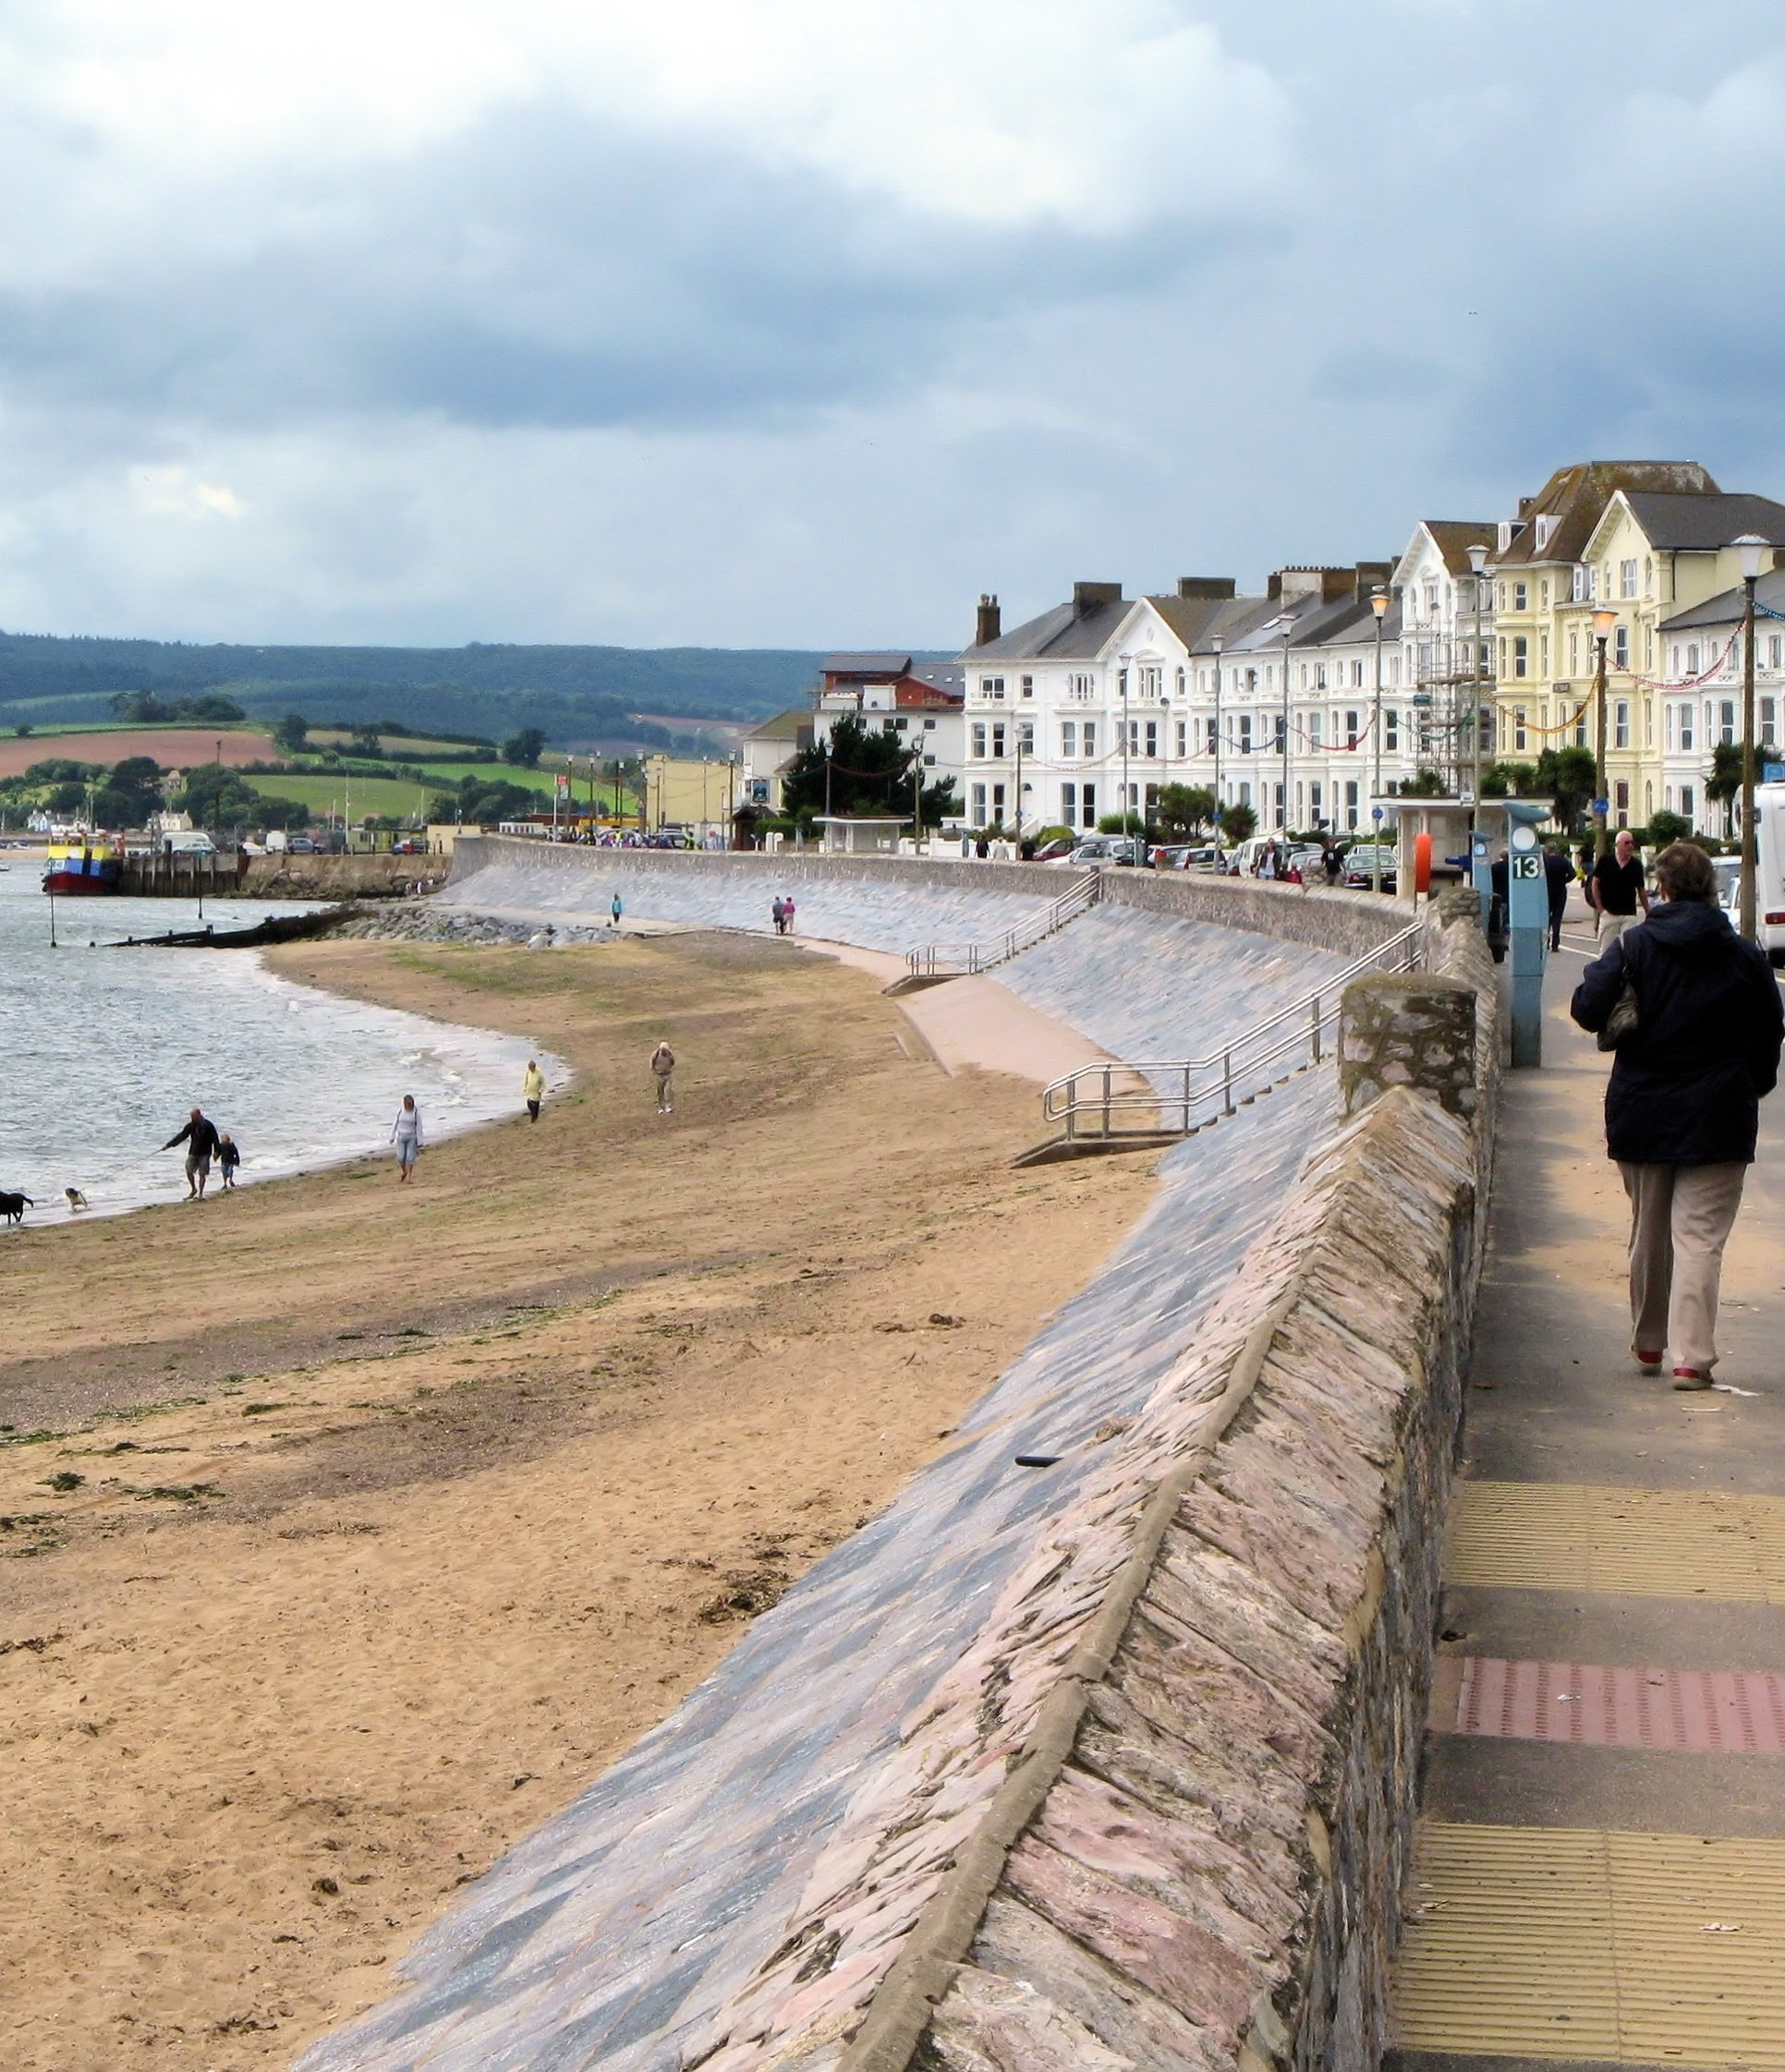 Exmouth beachfront